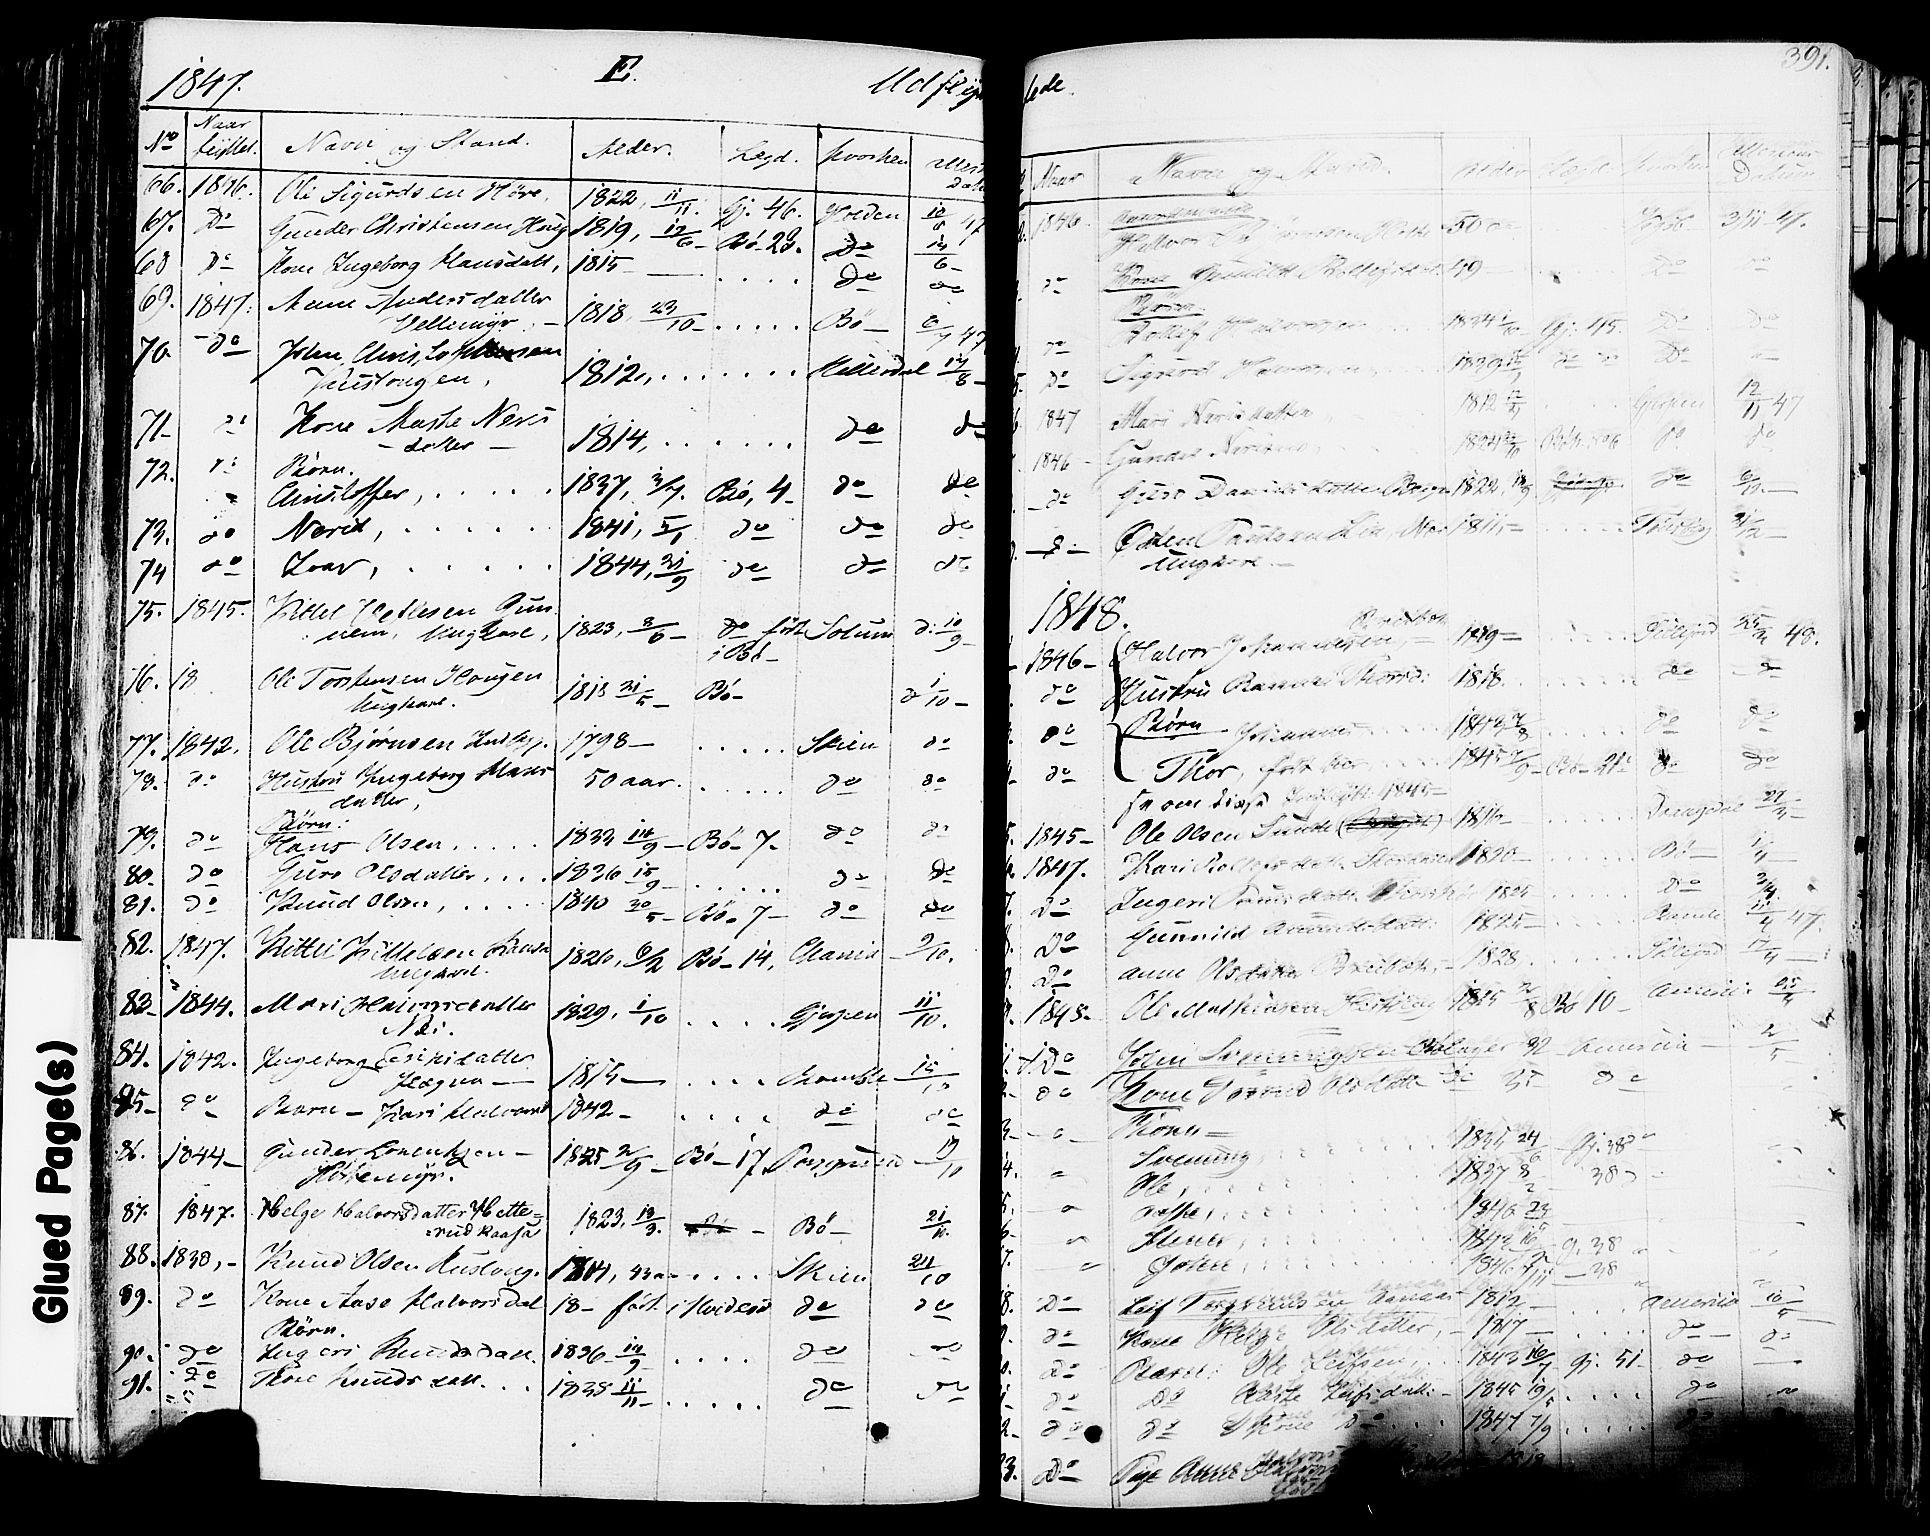 SAKO, Sauherad kirkebøker, F/Fa/L0006: Ministerialbok nr. I 6, 1827-1850, s. 391